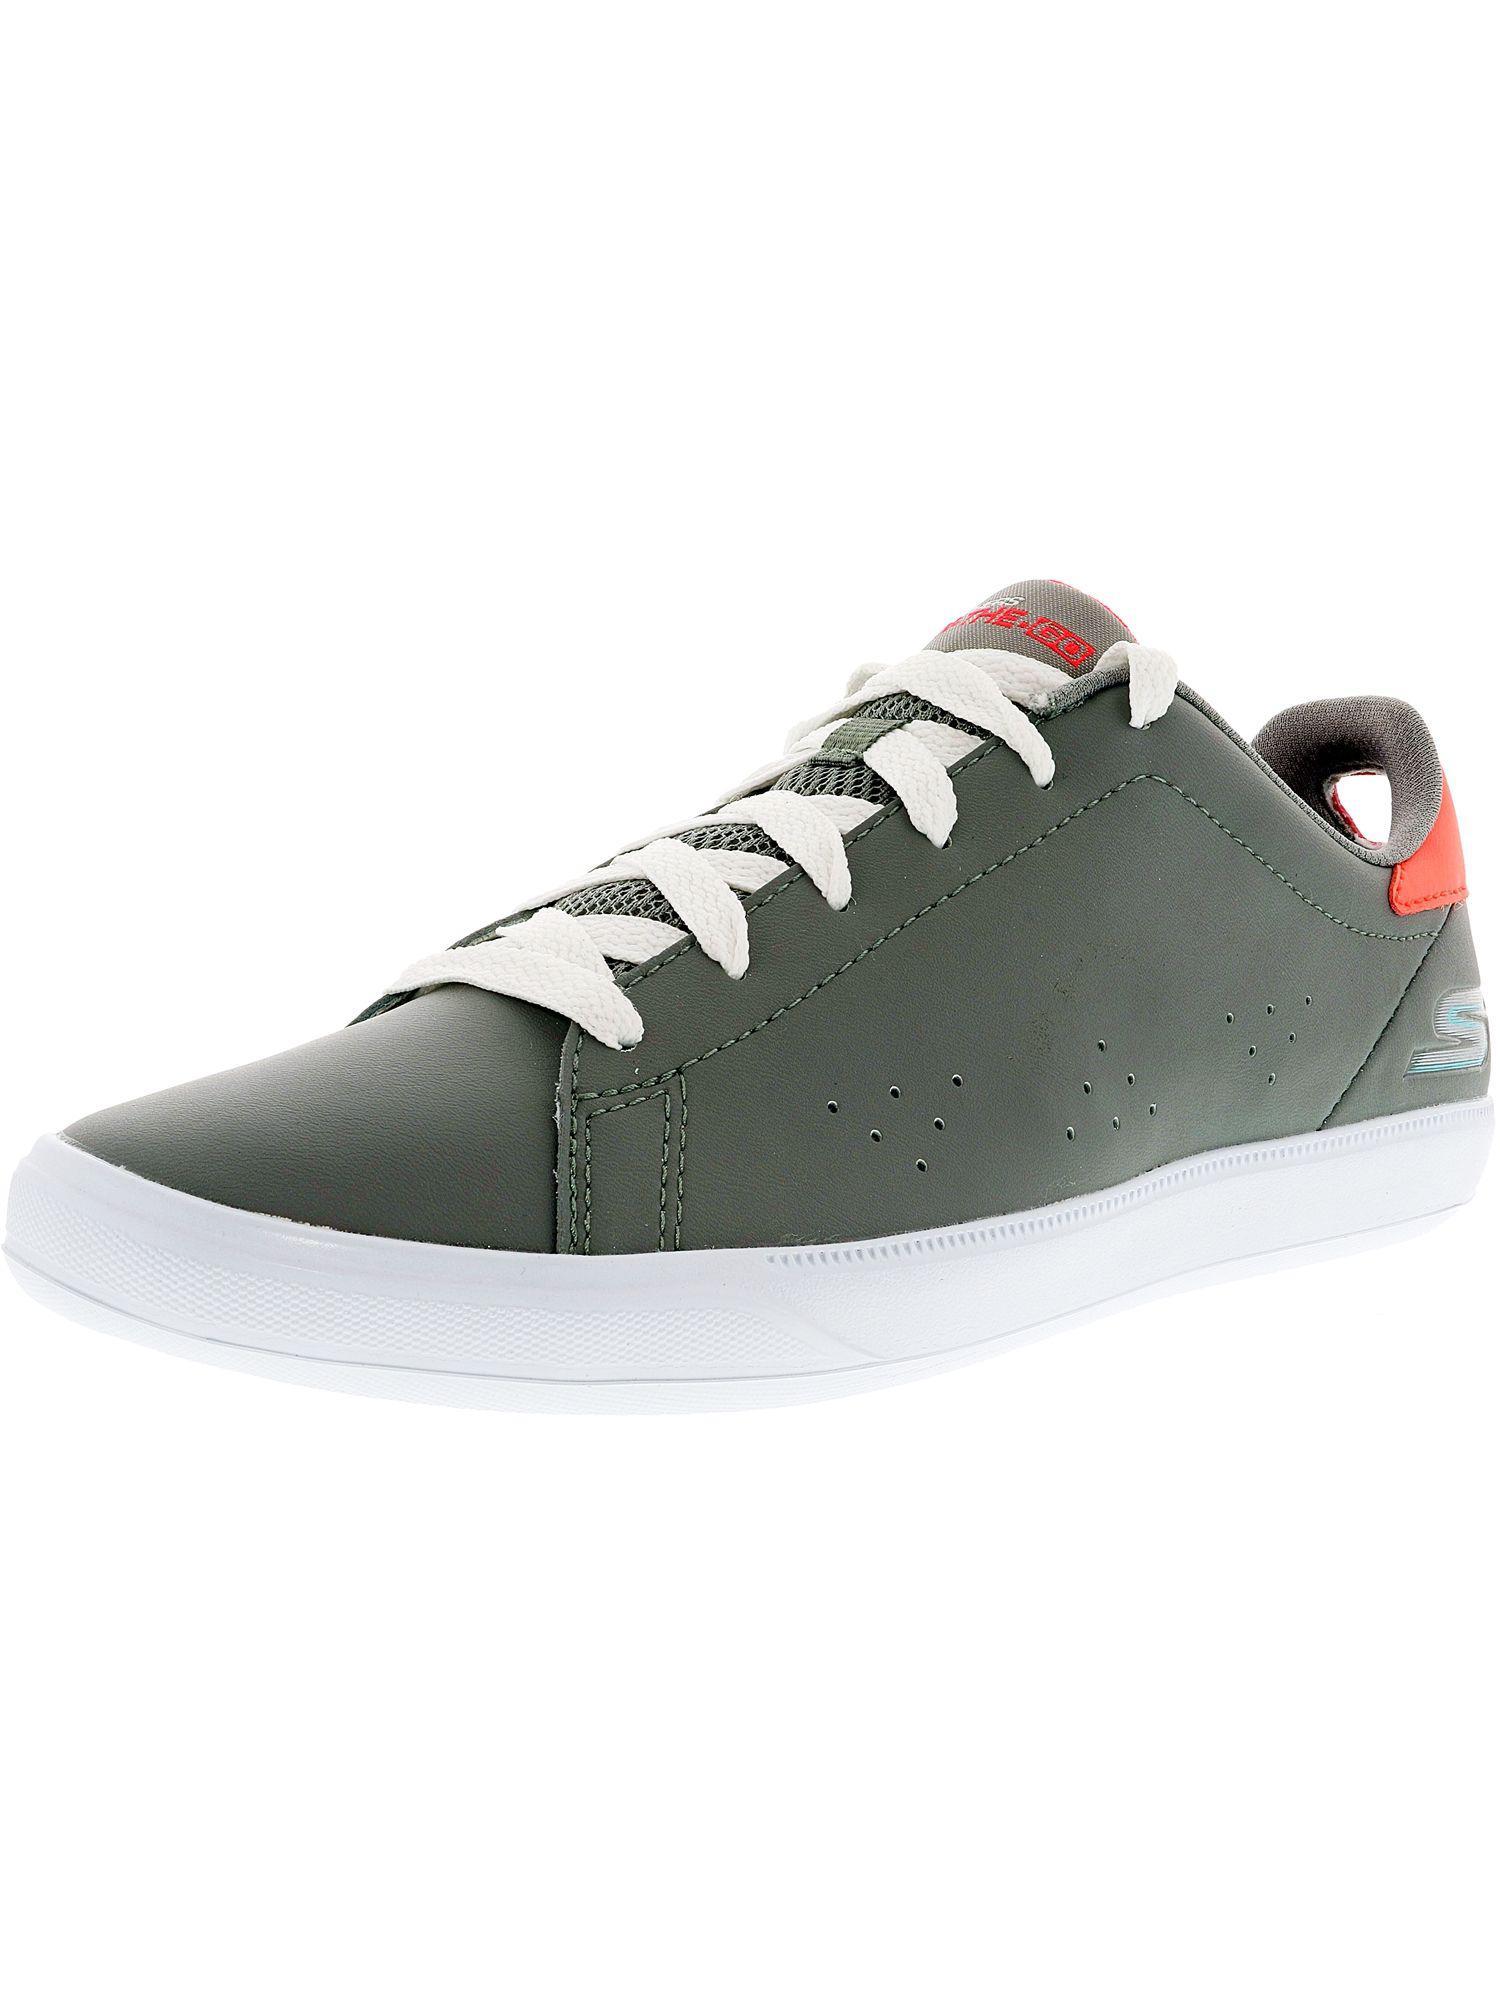 e6db1e868a Lyst - Skechers Women s On The Go Vulc 2 Gray Ankle-high Tennis Shoe ...